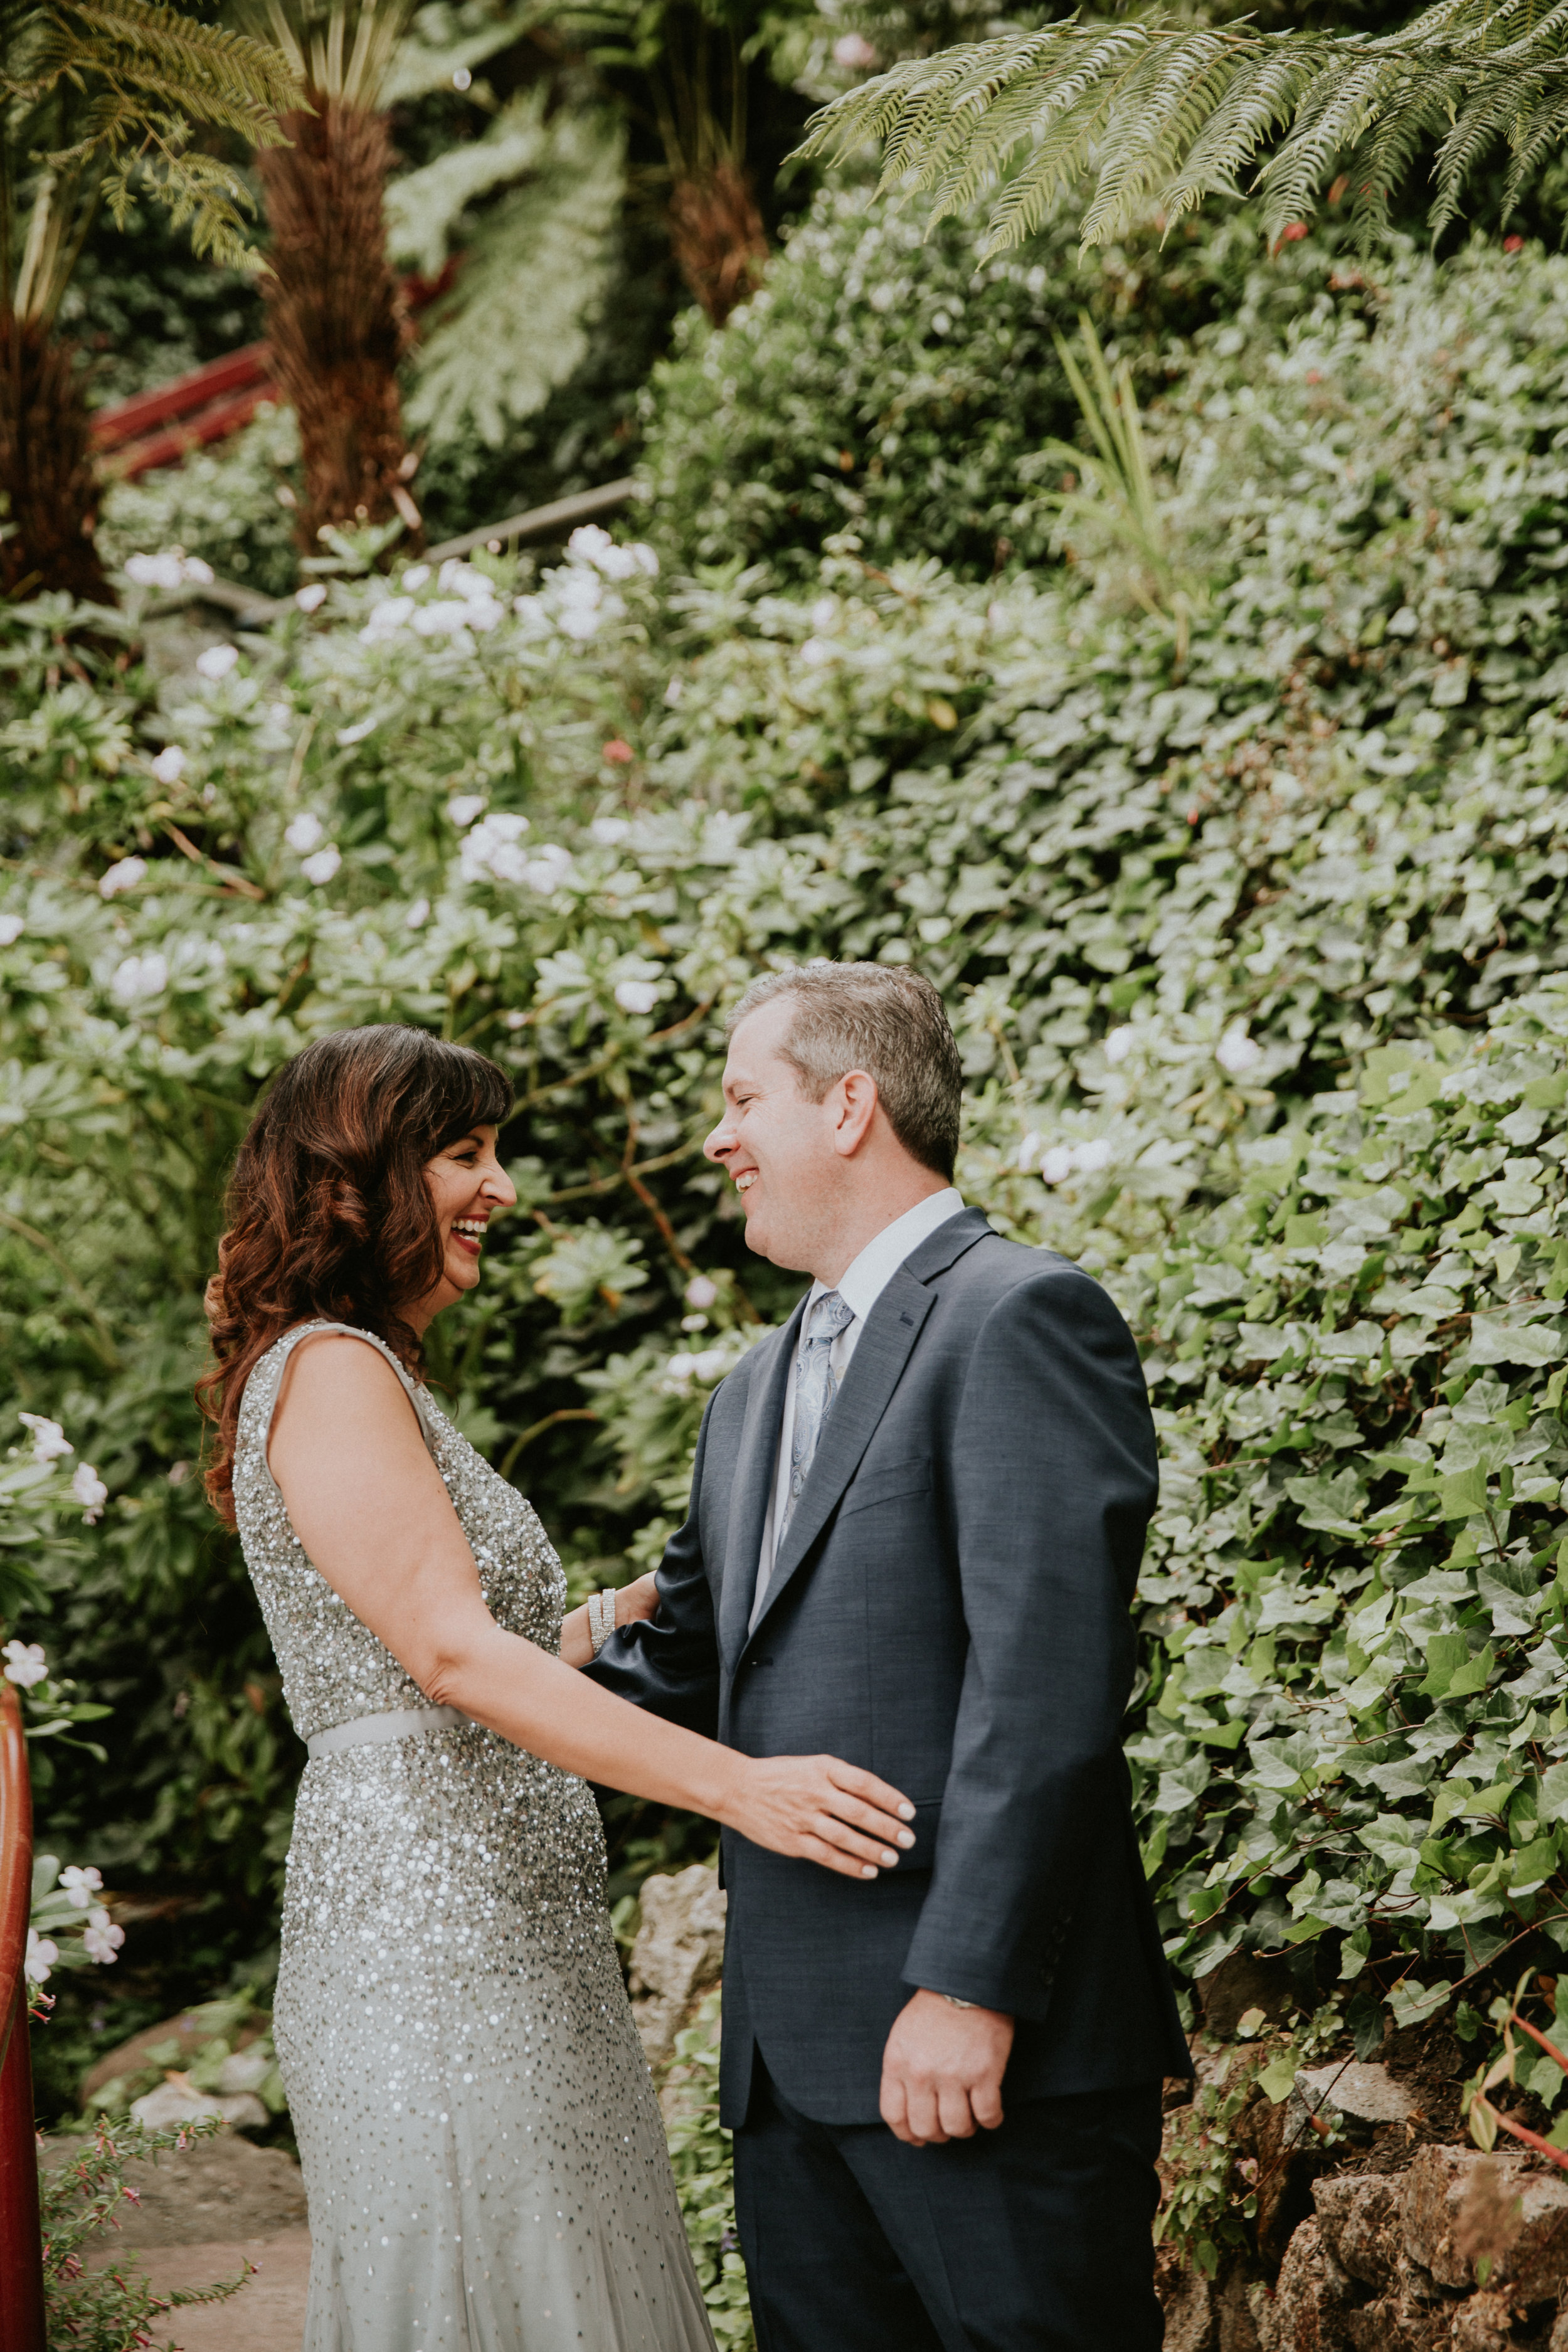 Capitola-Santa-Cruz-wedding-photographer-60.jpg